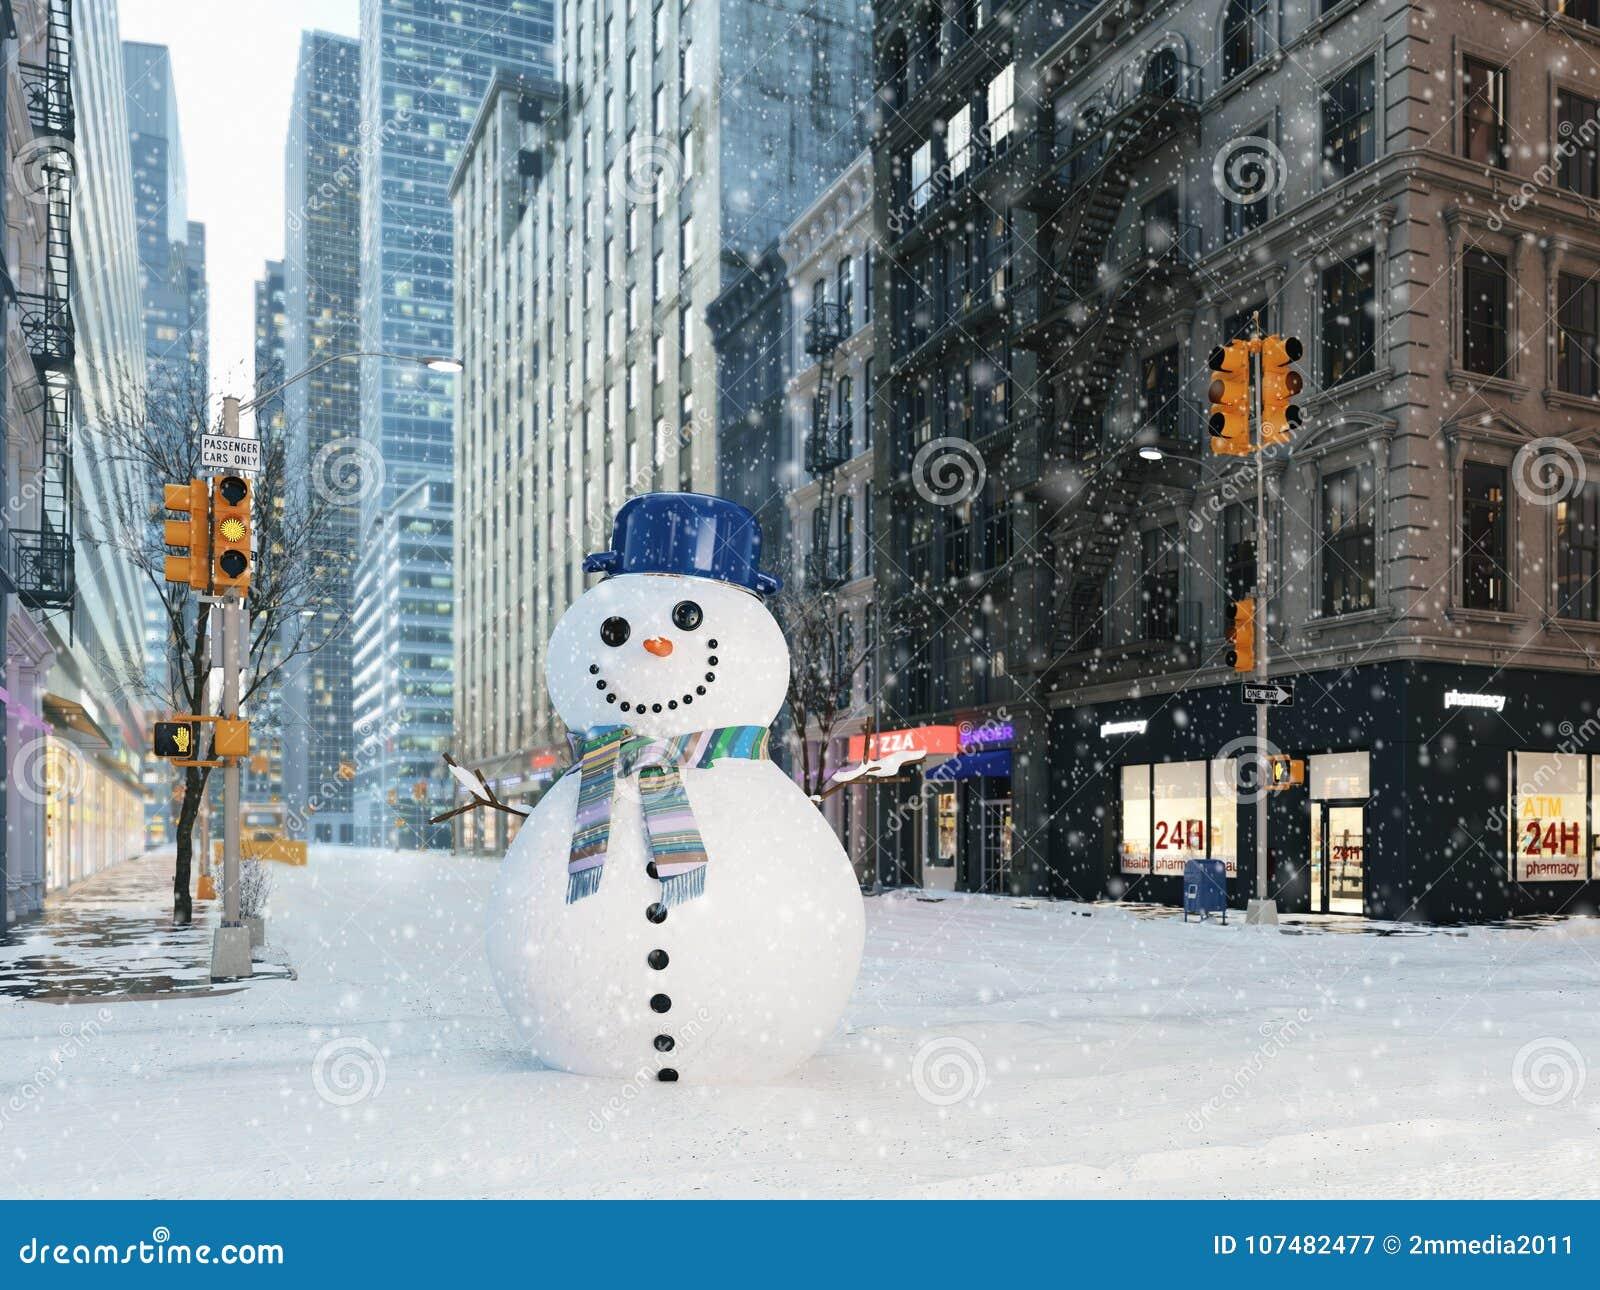 Blizzard in new york city. build snowman. 3d rendering